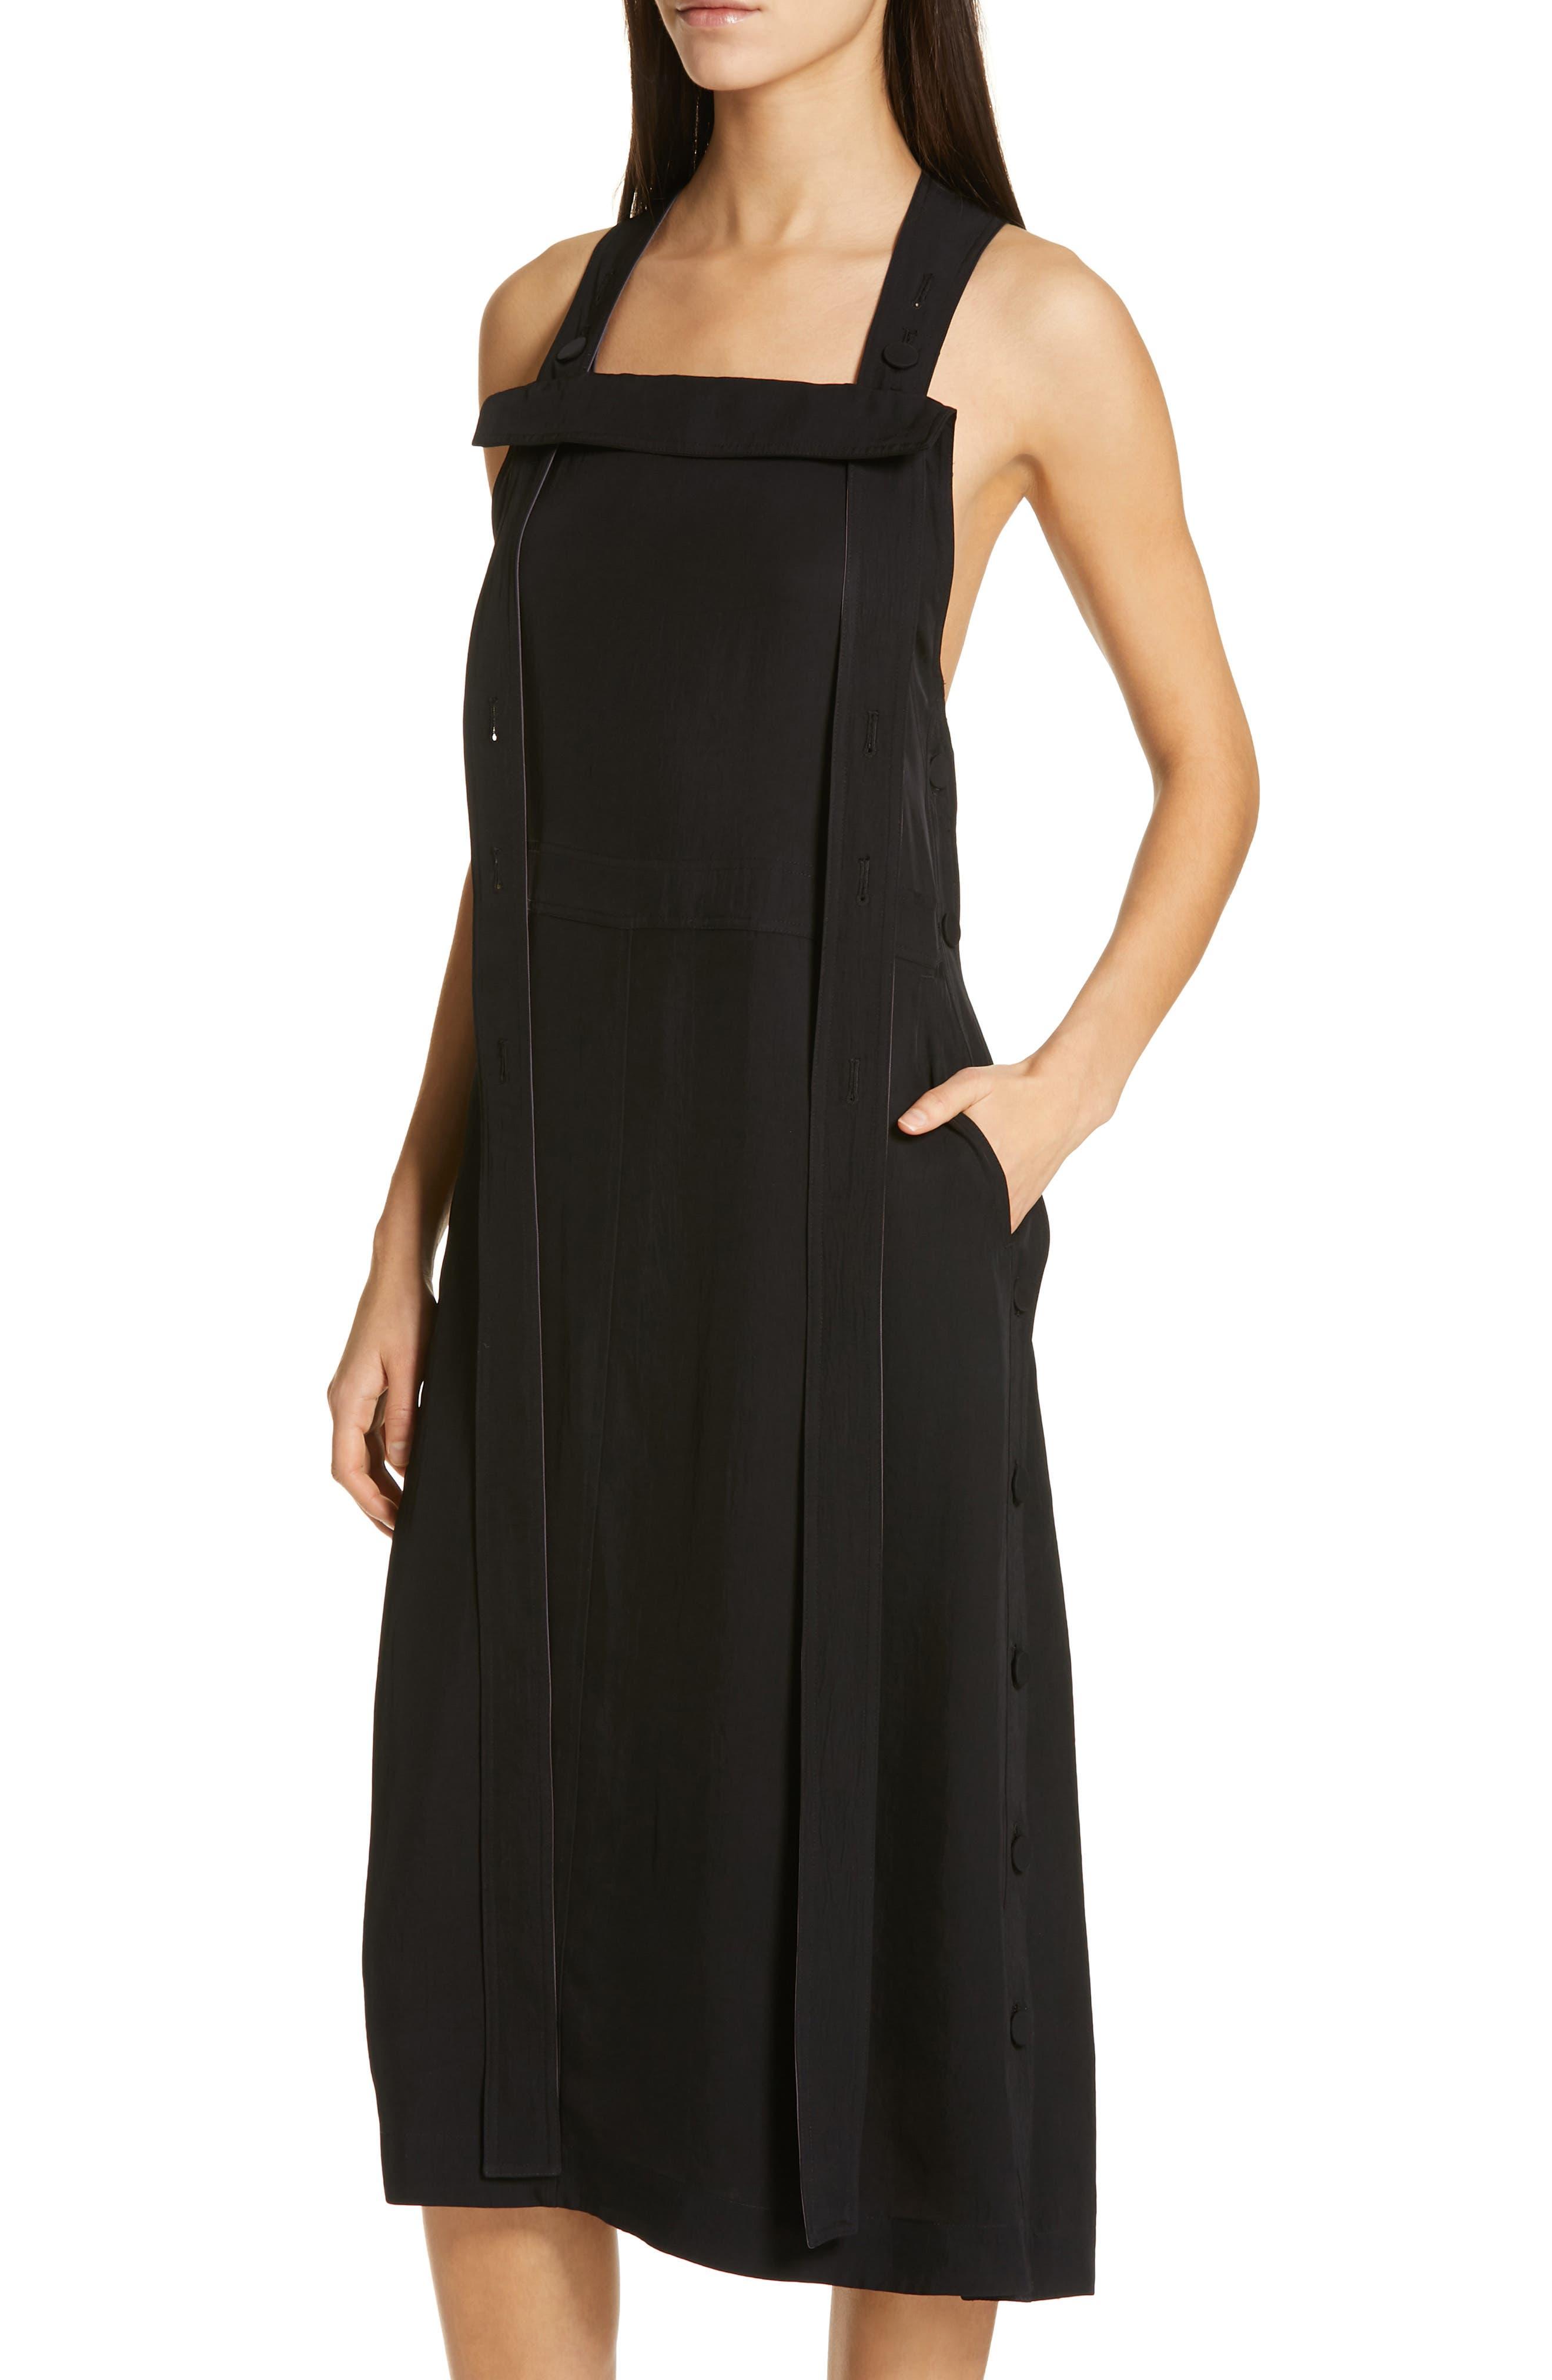 Adrian Pinafore Dress,                             Alternate thumbnail 4, color,                             BLACK